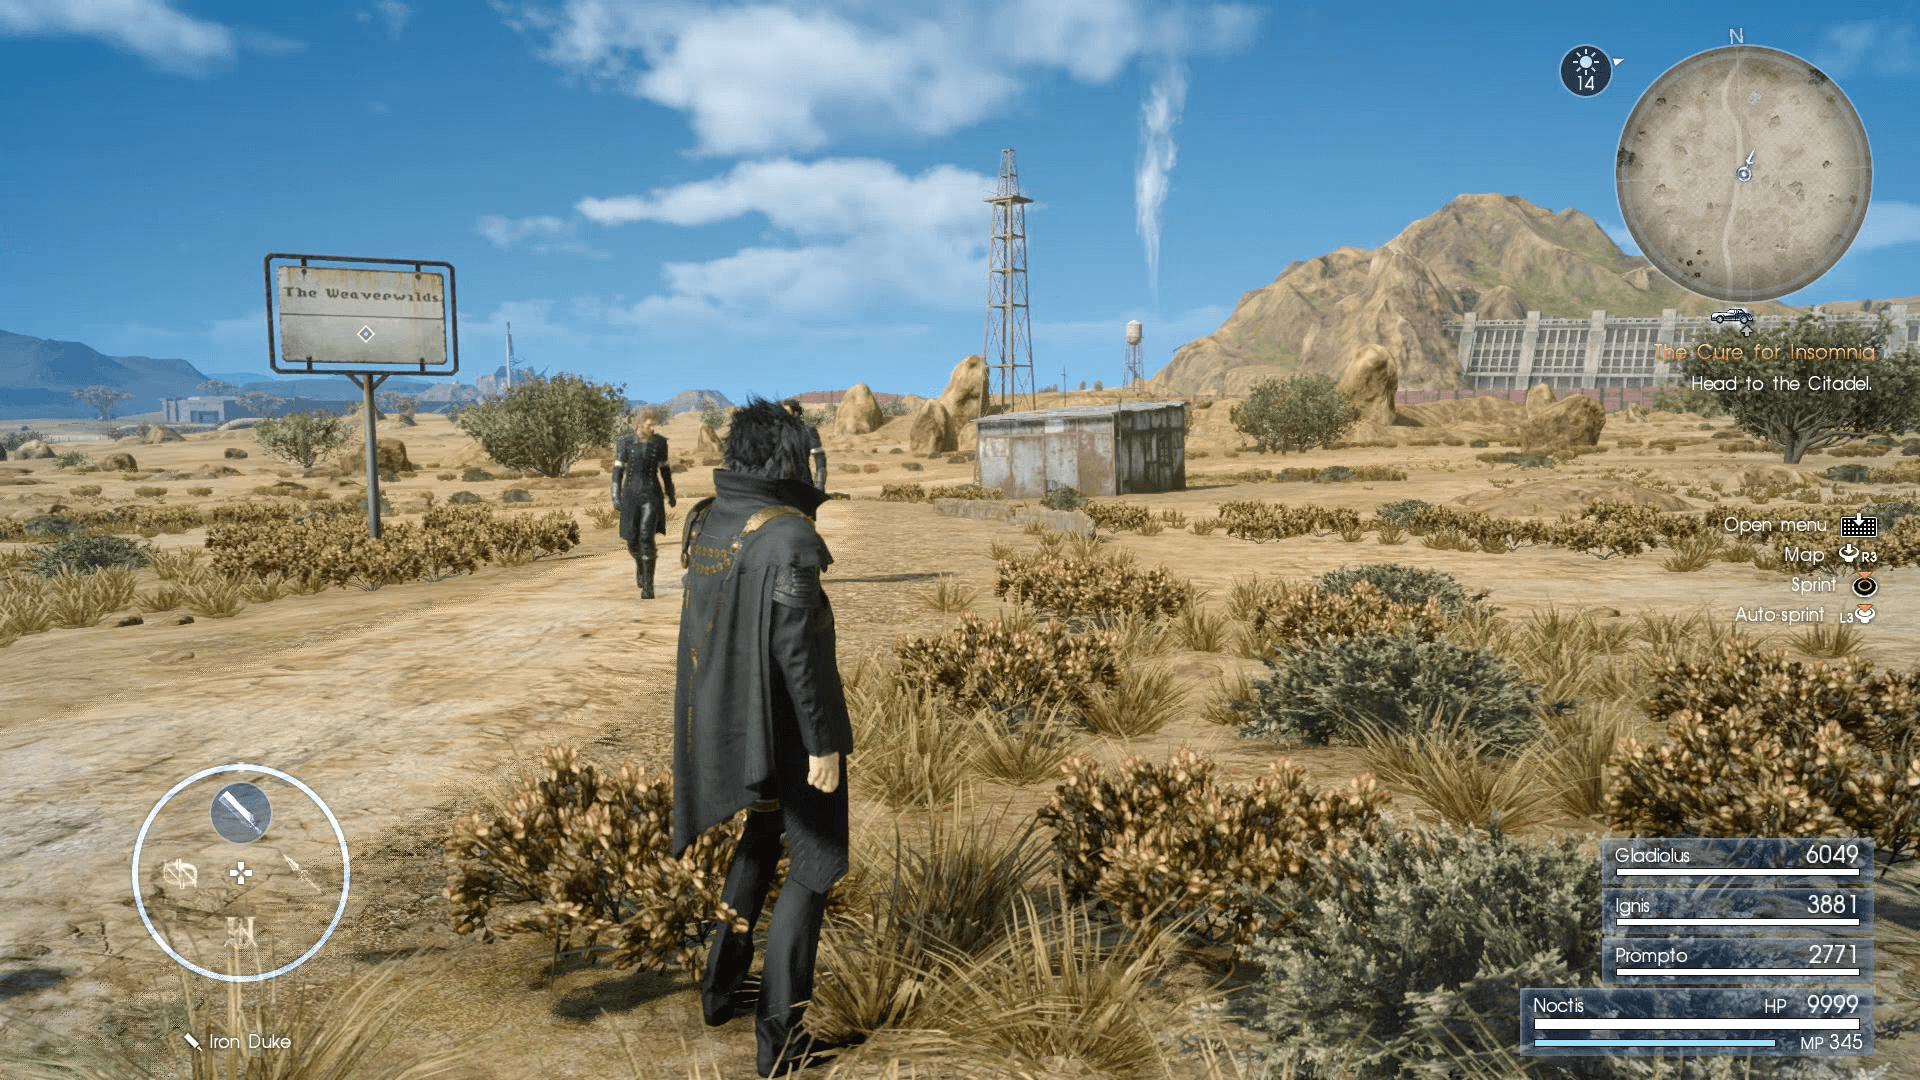 Final Fantasy XV - Unlimited AP Exploit (Farming Method)